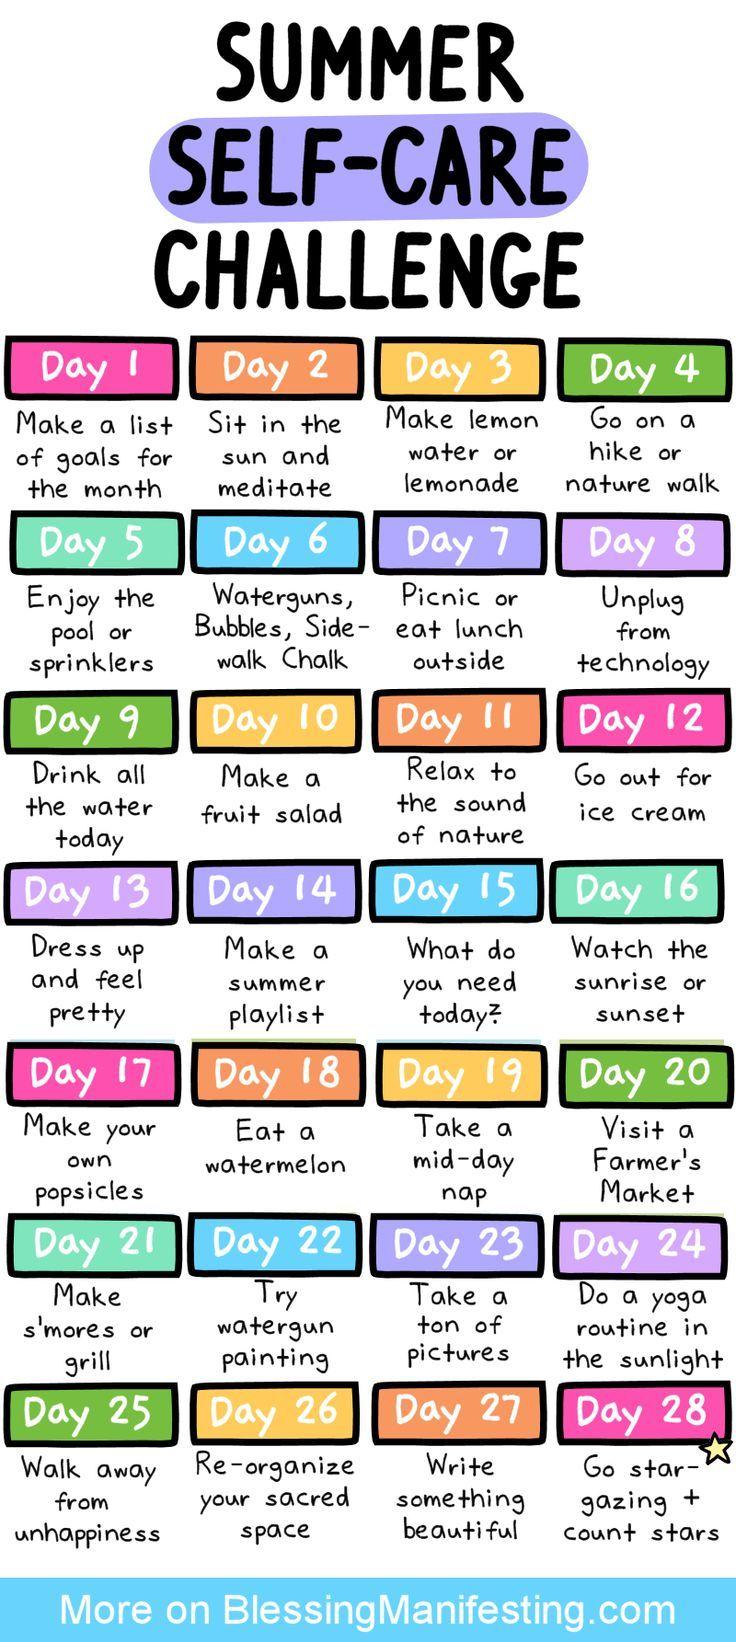 31 Self-Care-Ideen für den Sommer – Segen manifestiert sich   – Happiness + Positivity